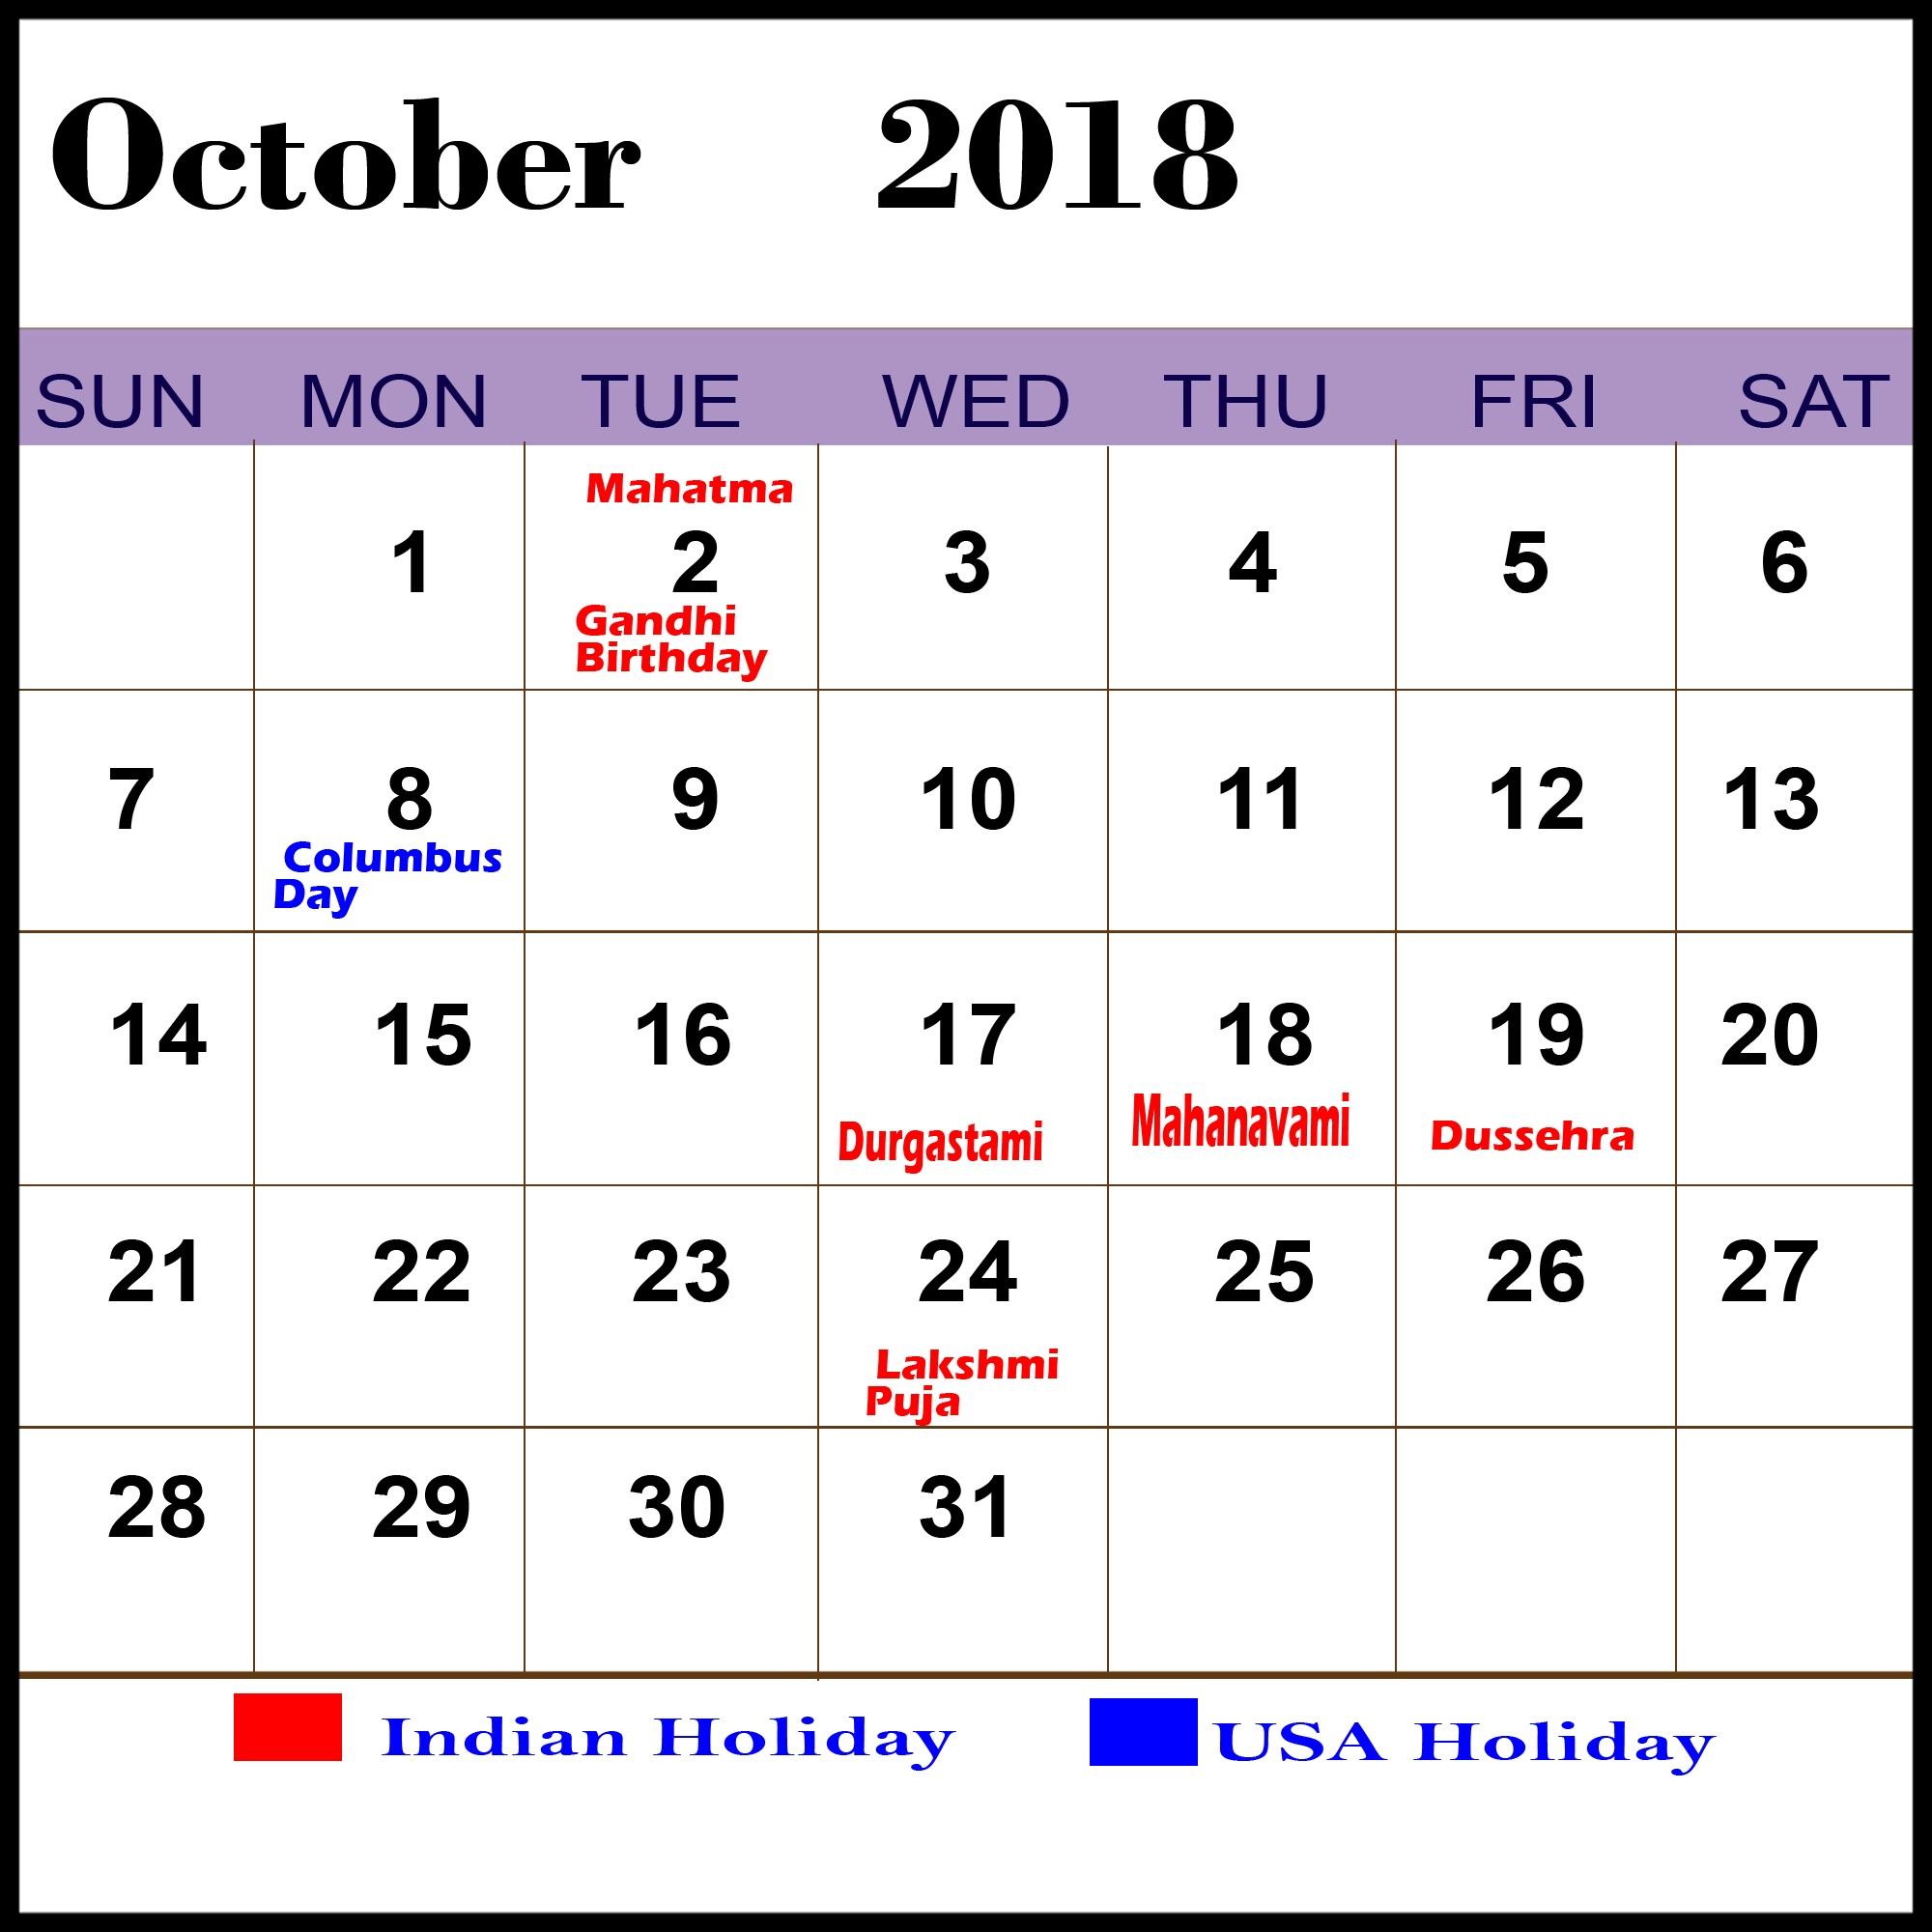 October 2018 Holiday Calendar UK